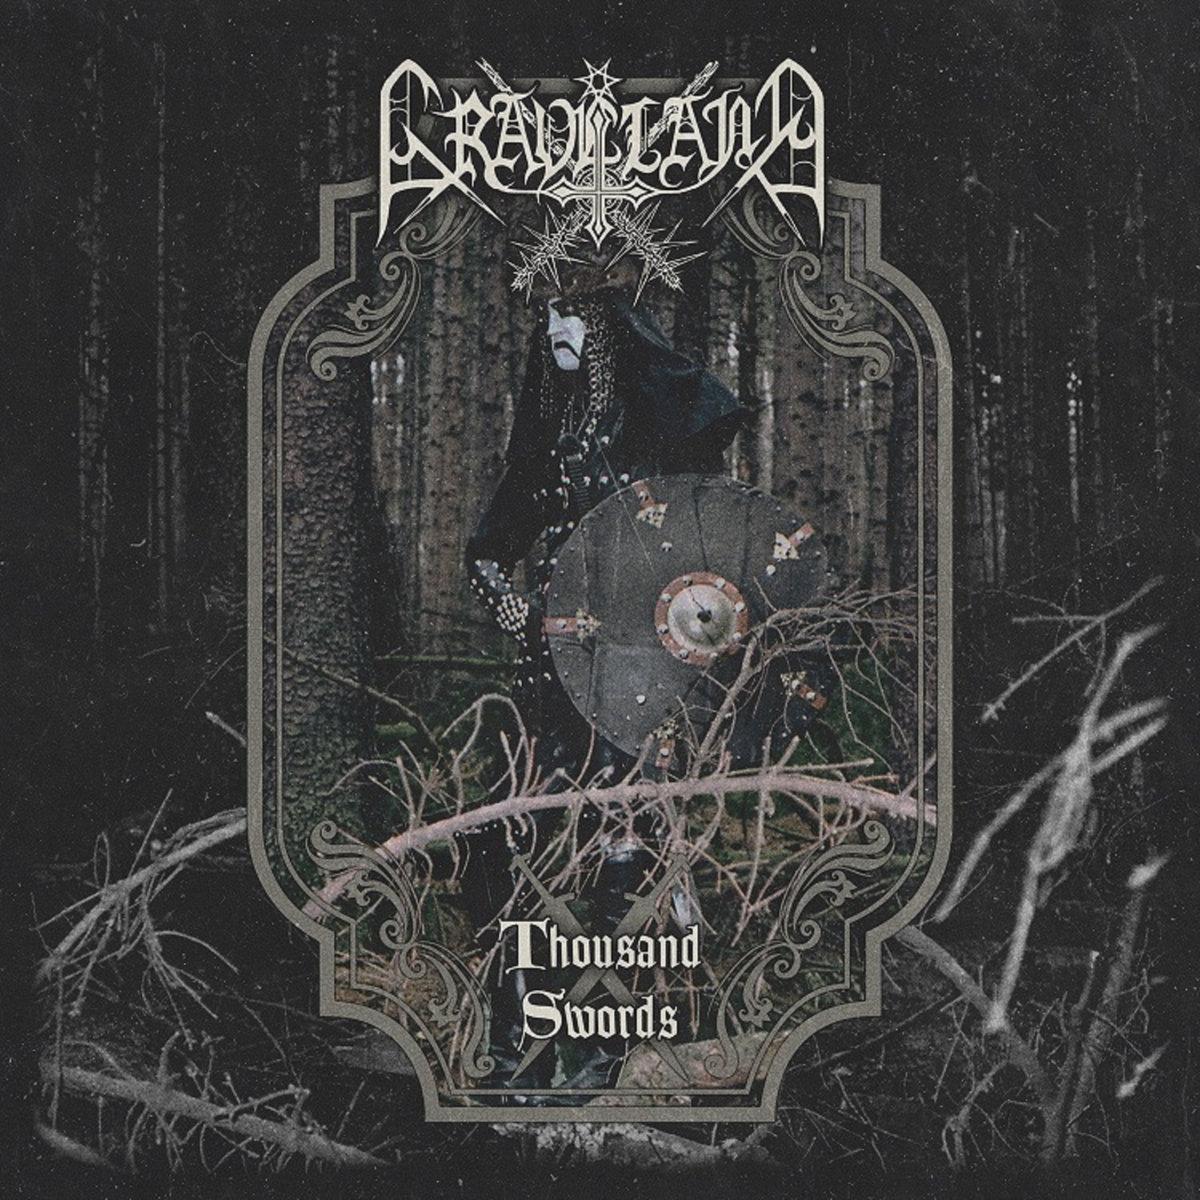 Thousand Swords Graveland Inferna Profundus Records